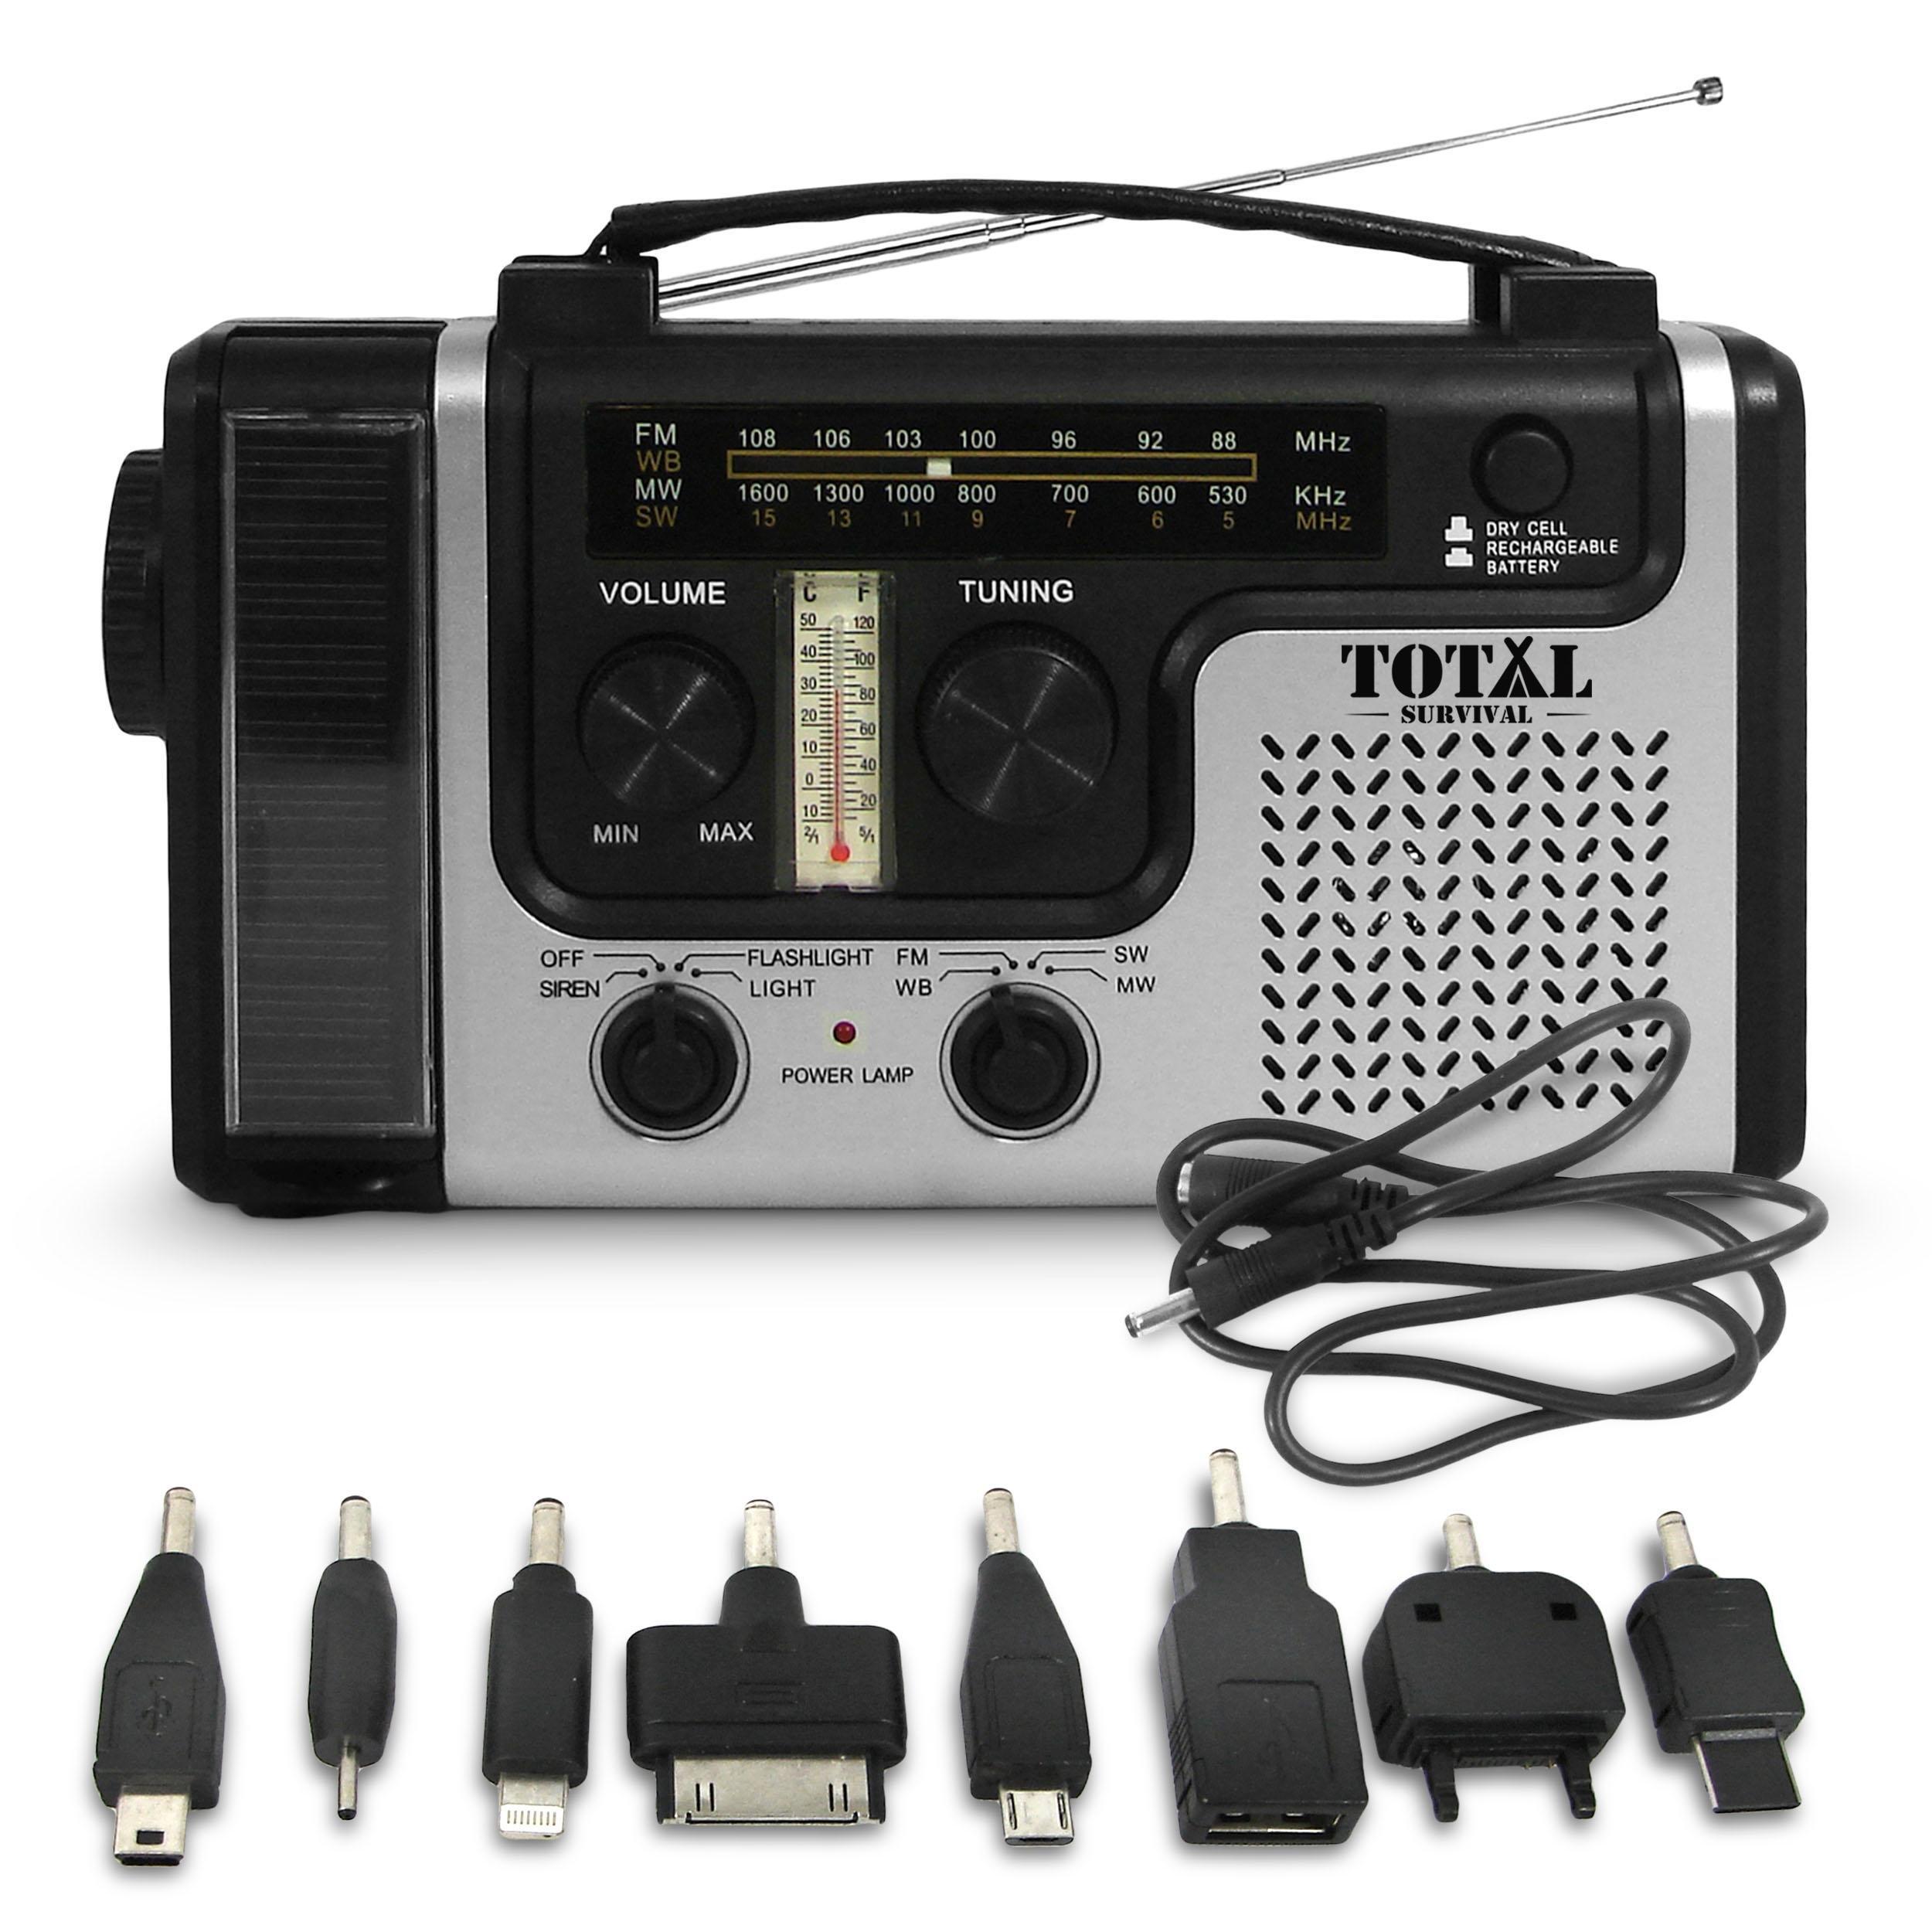 TOTAL SURVIVAL Dynamo Solar Hand Crank AM/FM NOAA Weather Emergency Radio, Smart Phone Charger & Flashlight